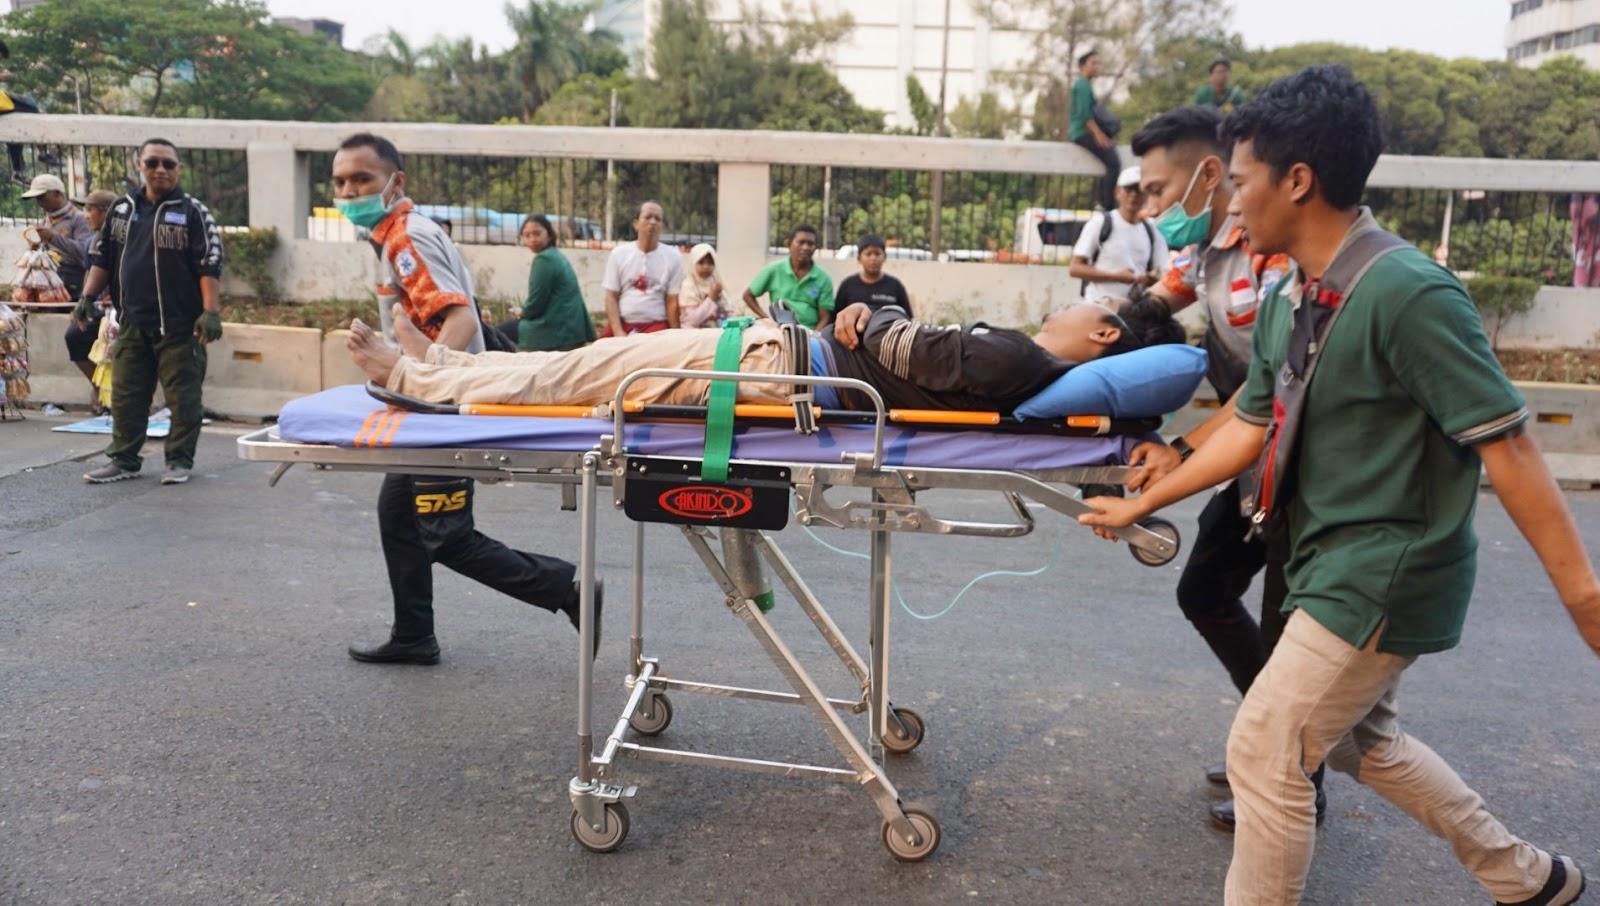 Detik-detik Ketua DPR Mendadak Kabur, Batal Menemui Massa Mahasiswa